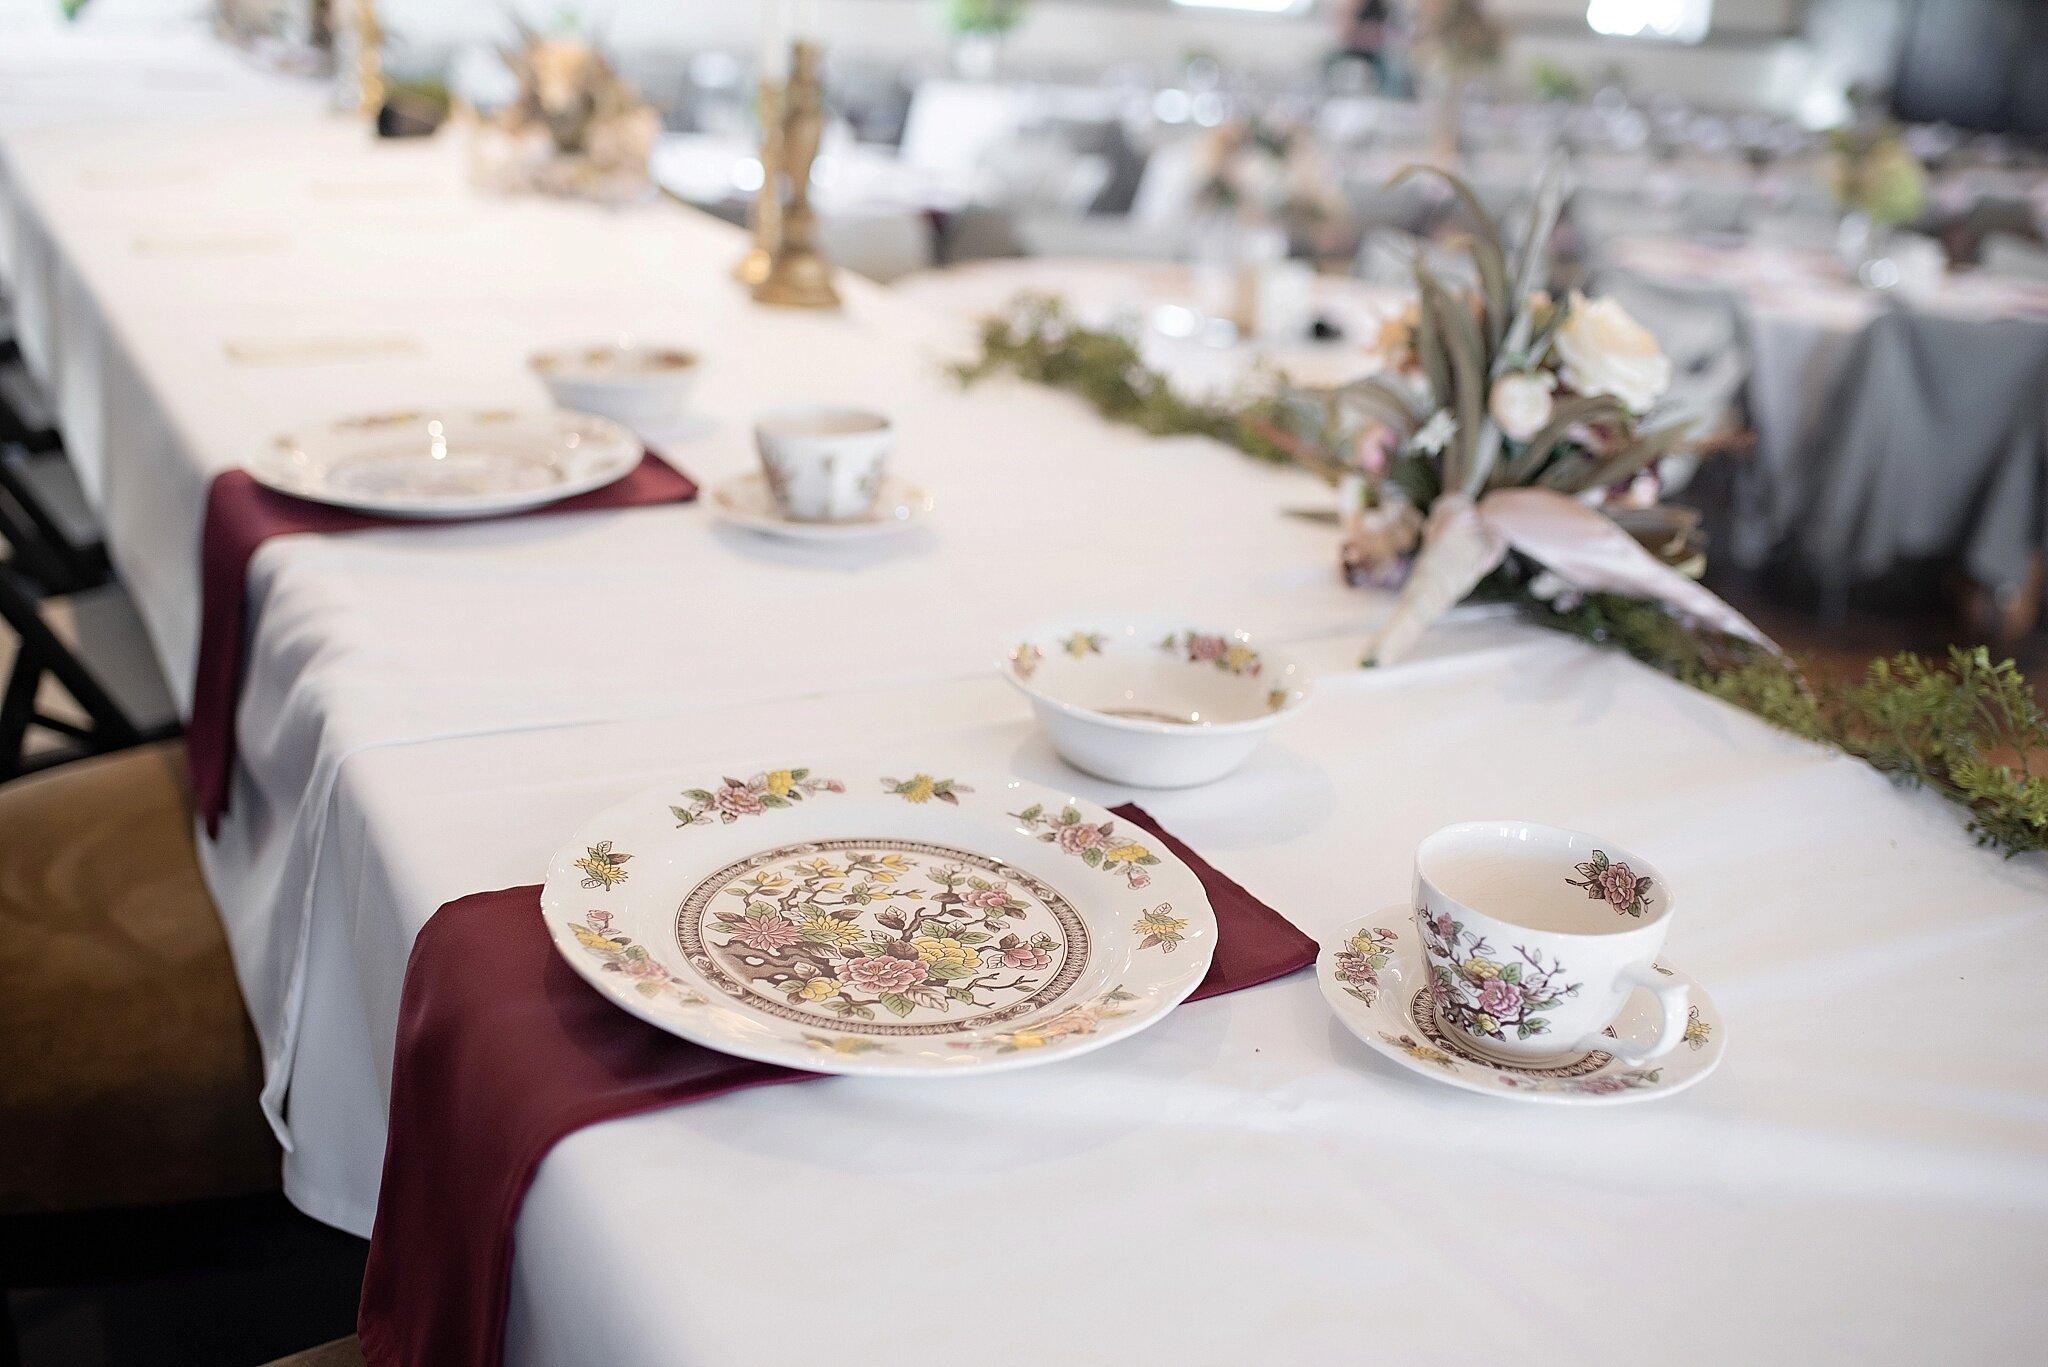 vintage china at the head table vineyard wedding